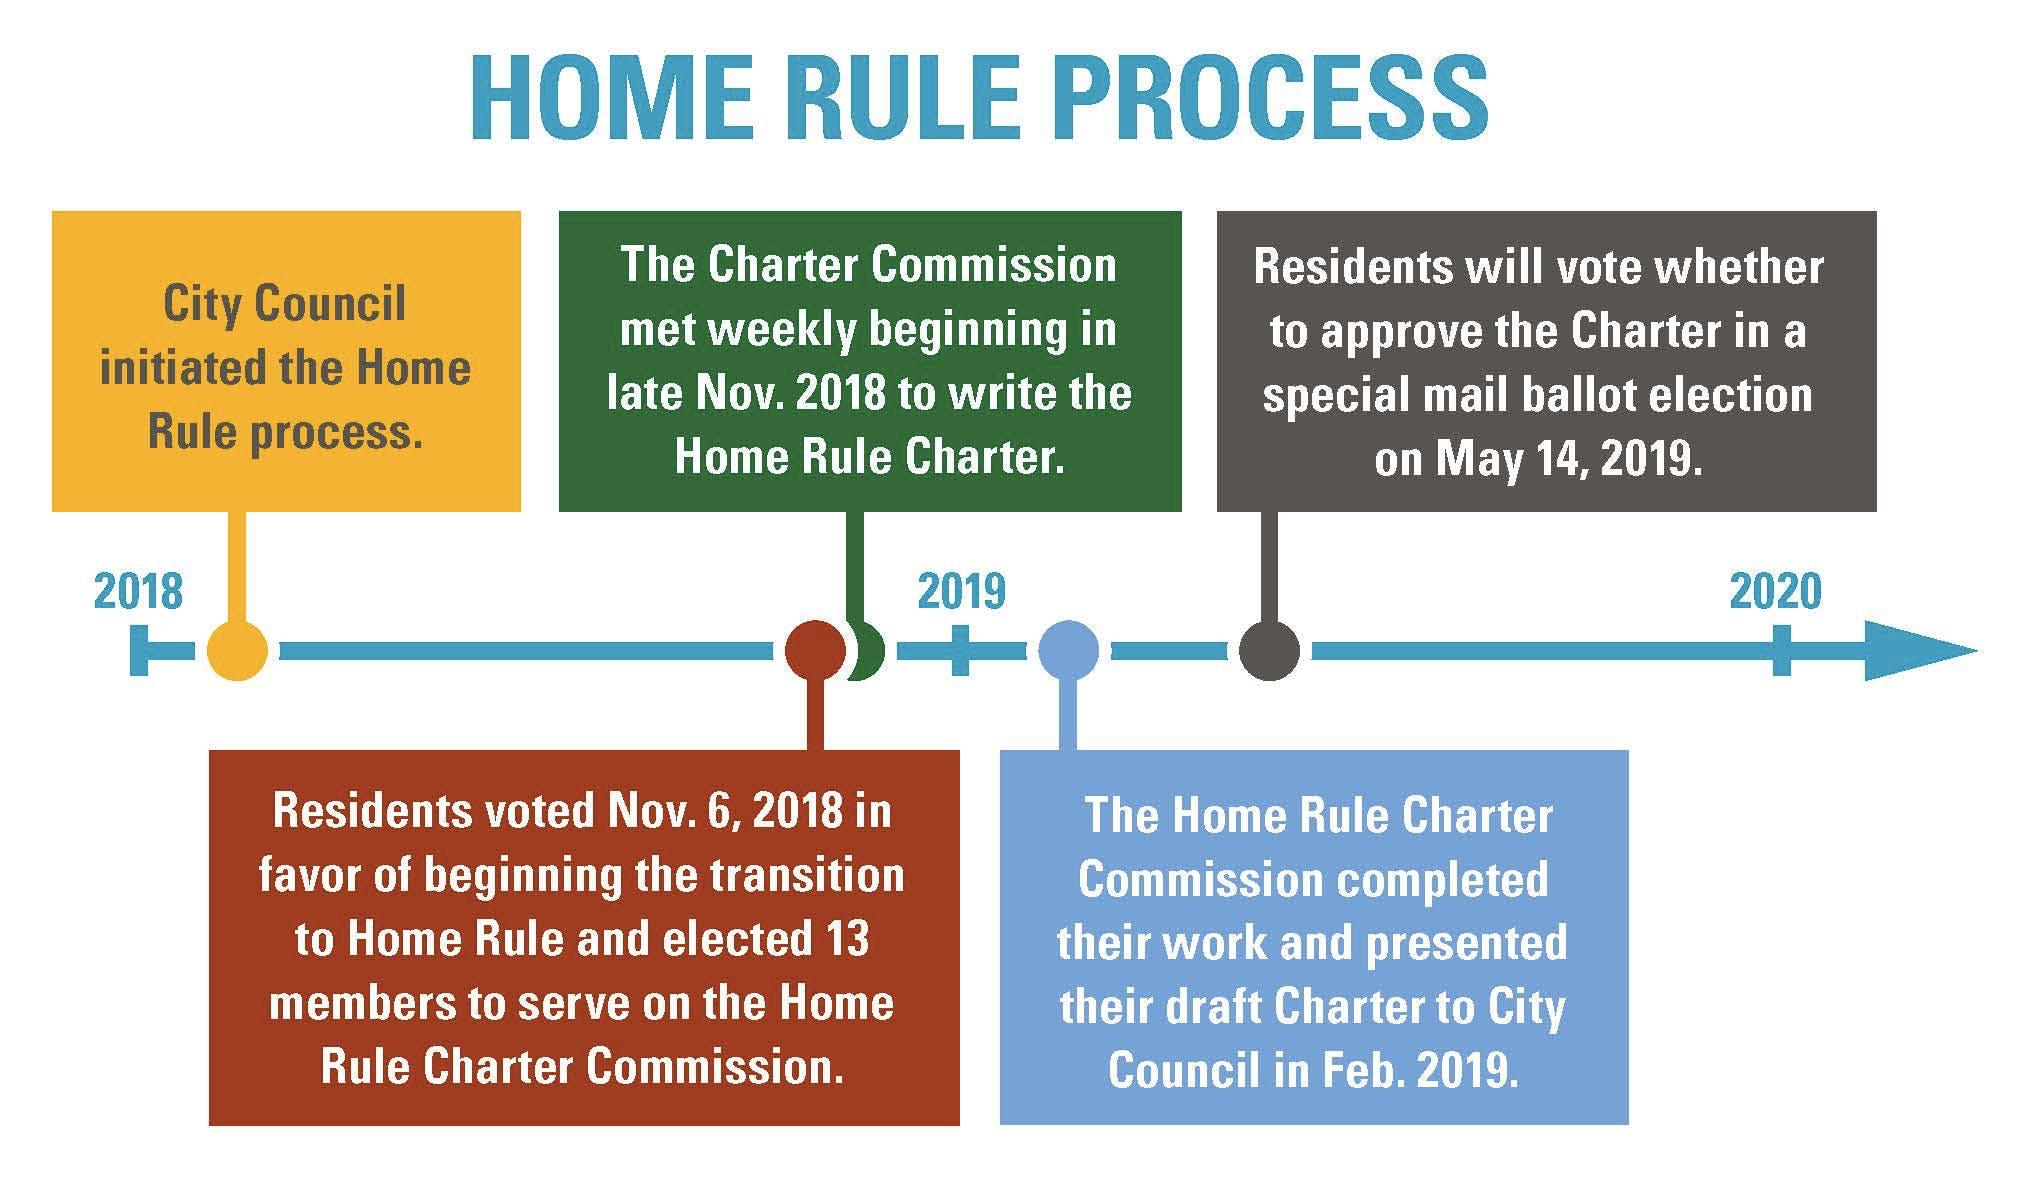 Home Rule Timeline